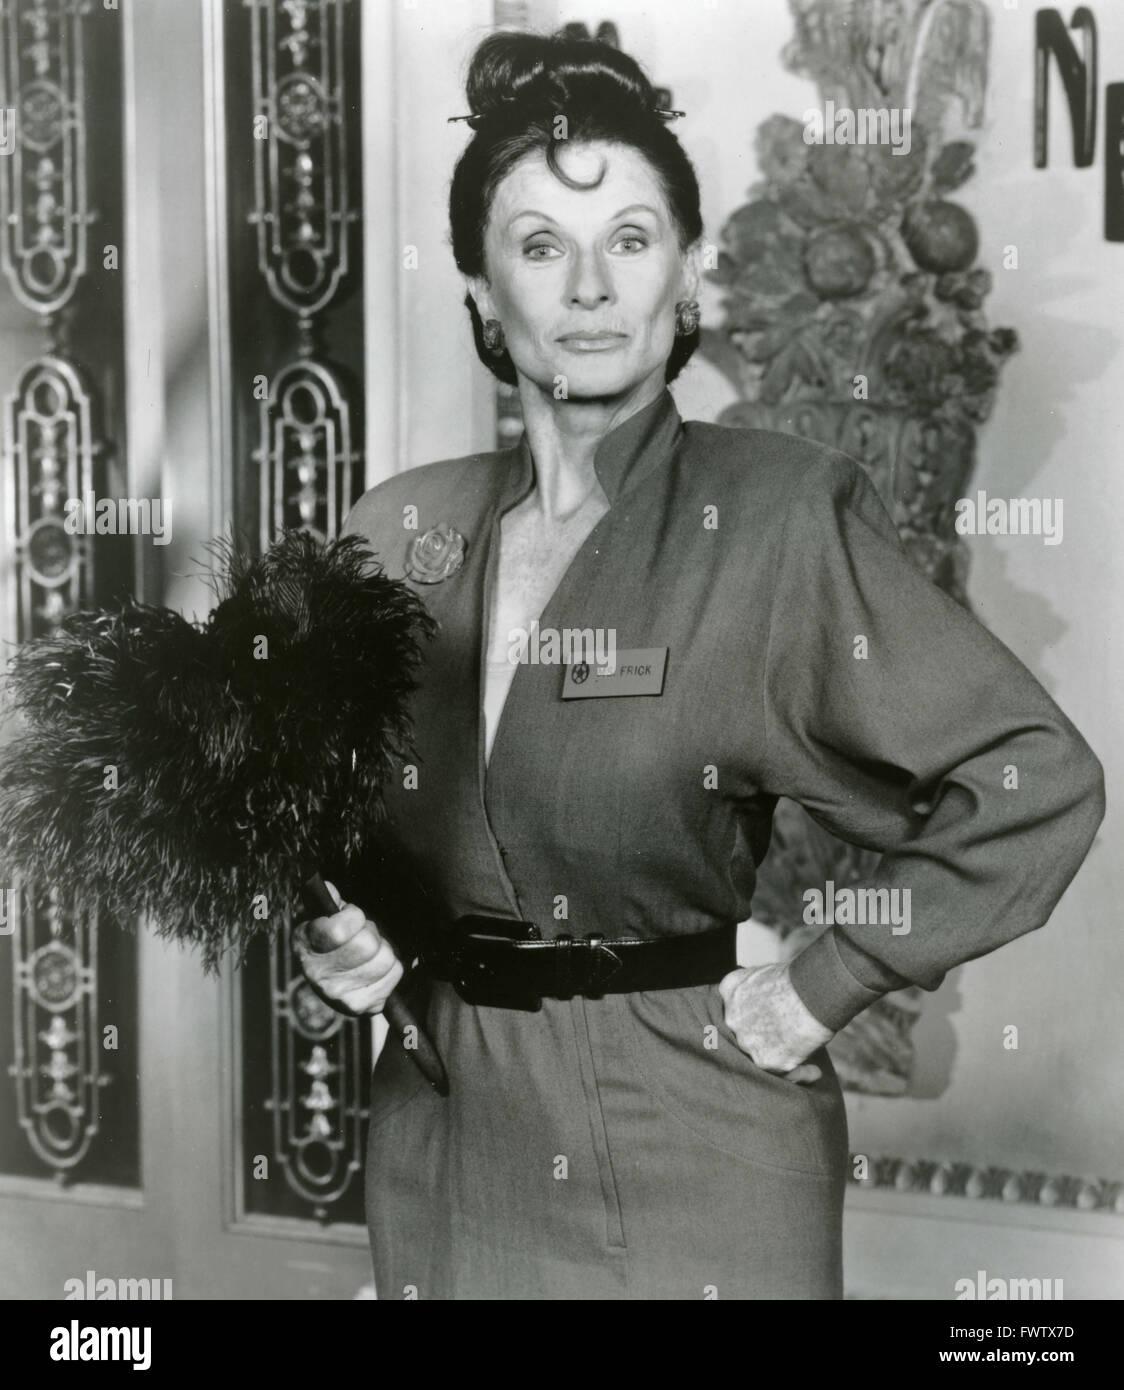 Cloris Leachman als Frau Frick in den Nutt House, USA 1989 Stockbild